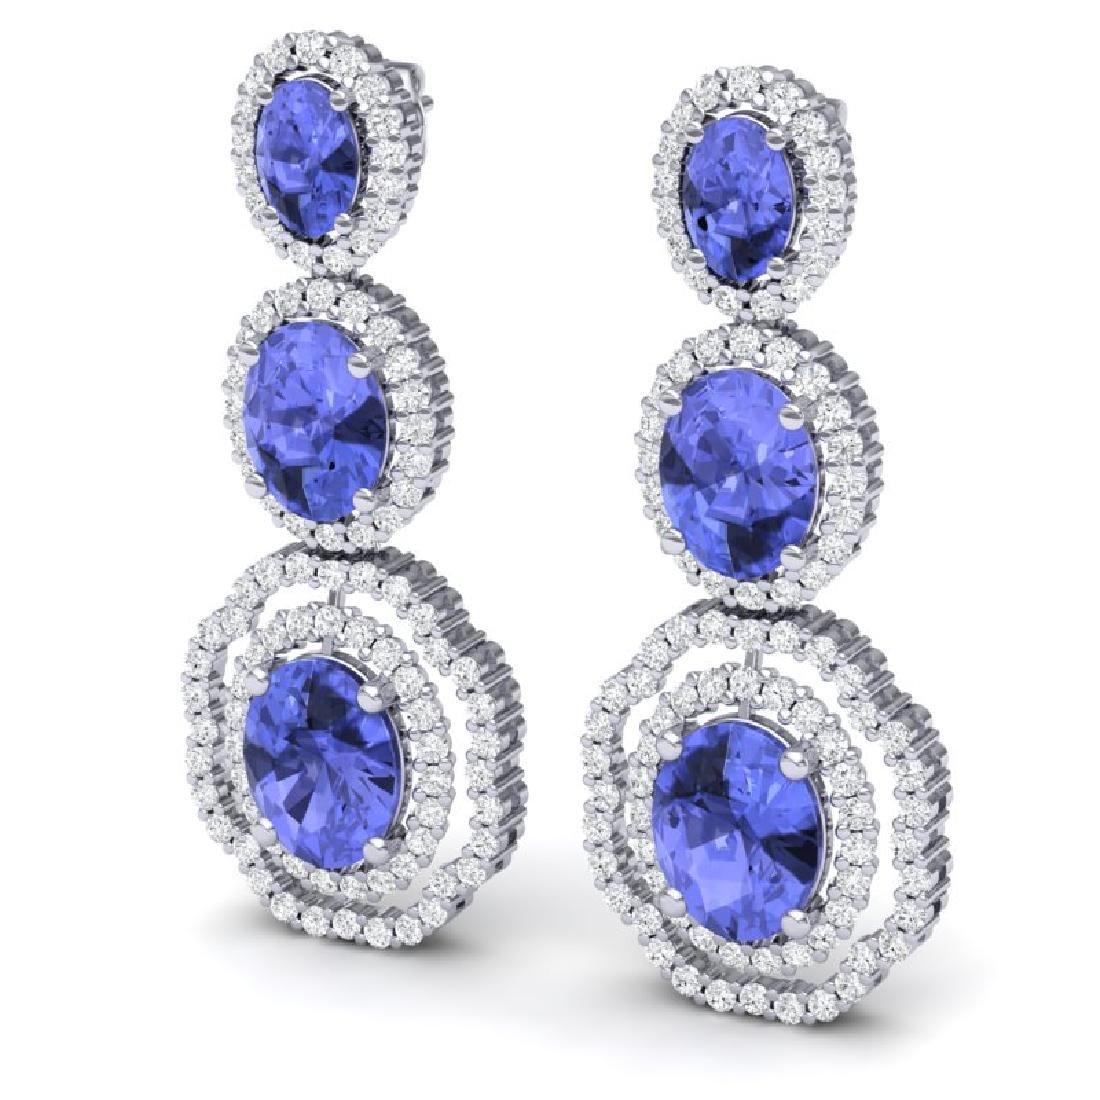 17.32 CTW Royalty Tanzanite & VS Diamond Earrings 18K - 2